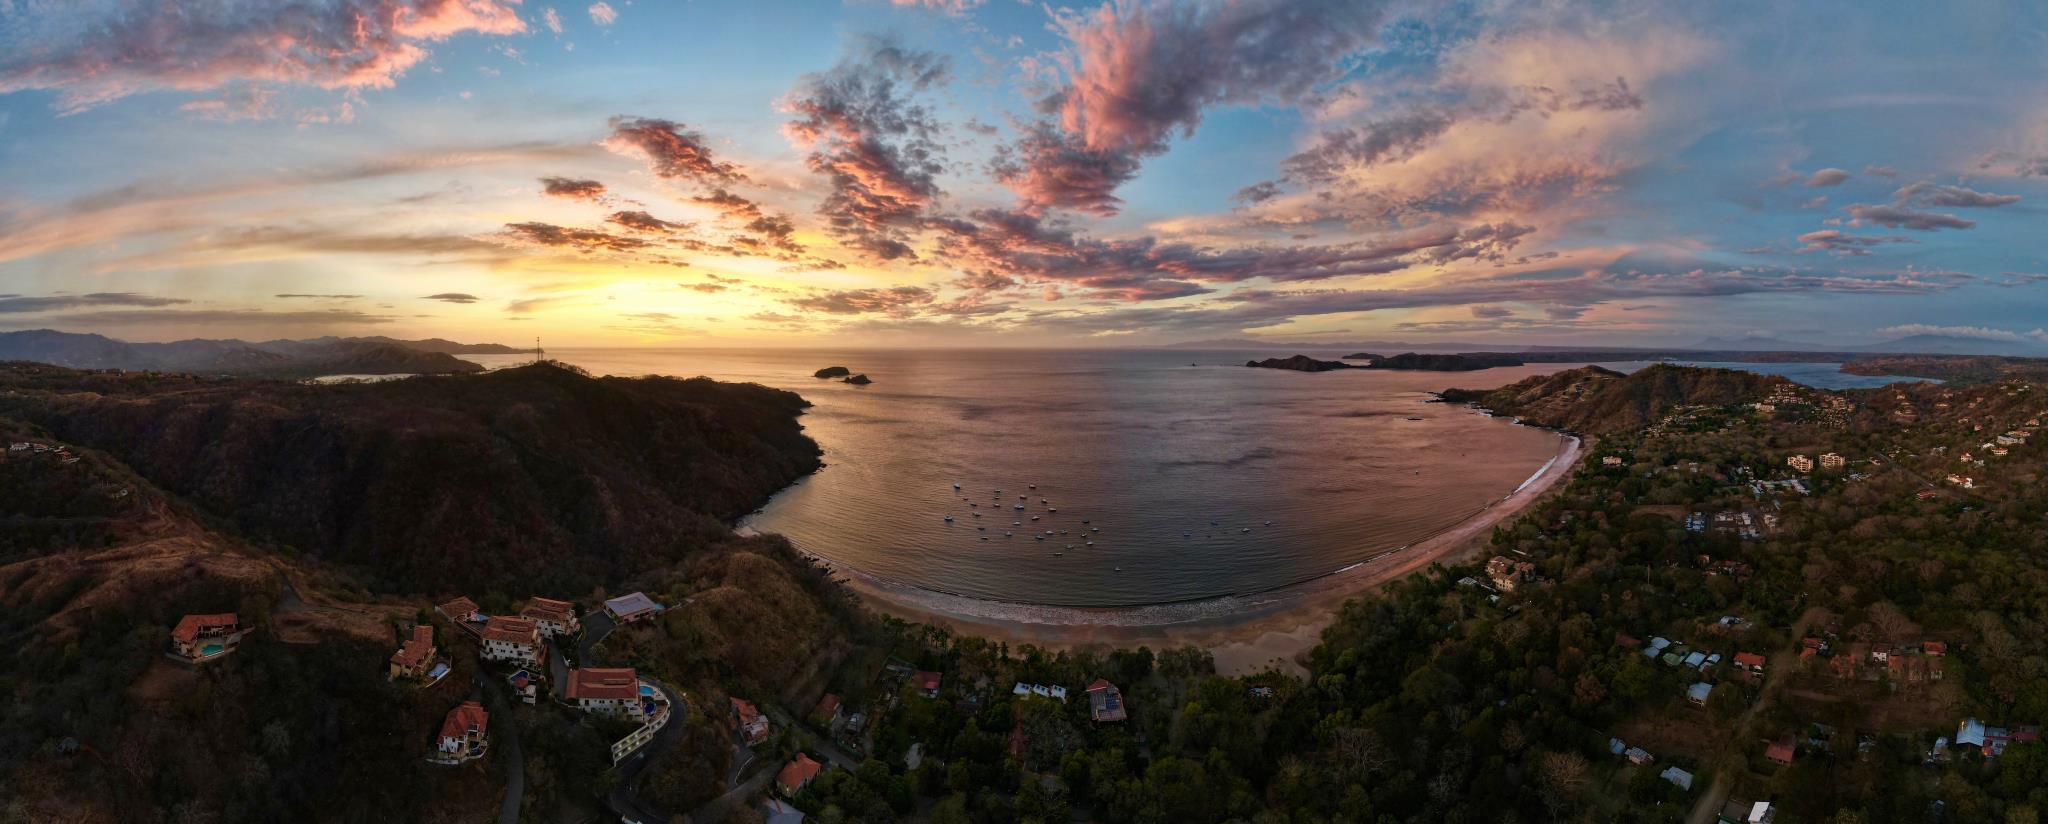 Sunset drone shot of Playa Hermosa